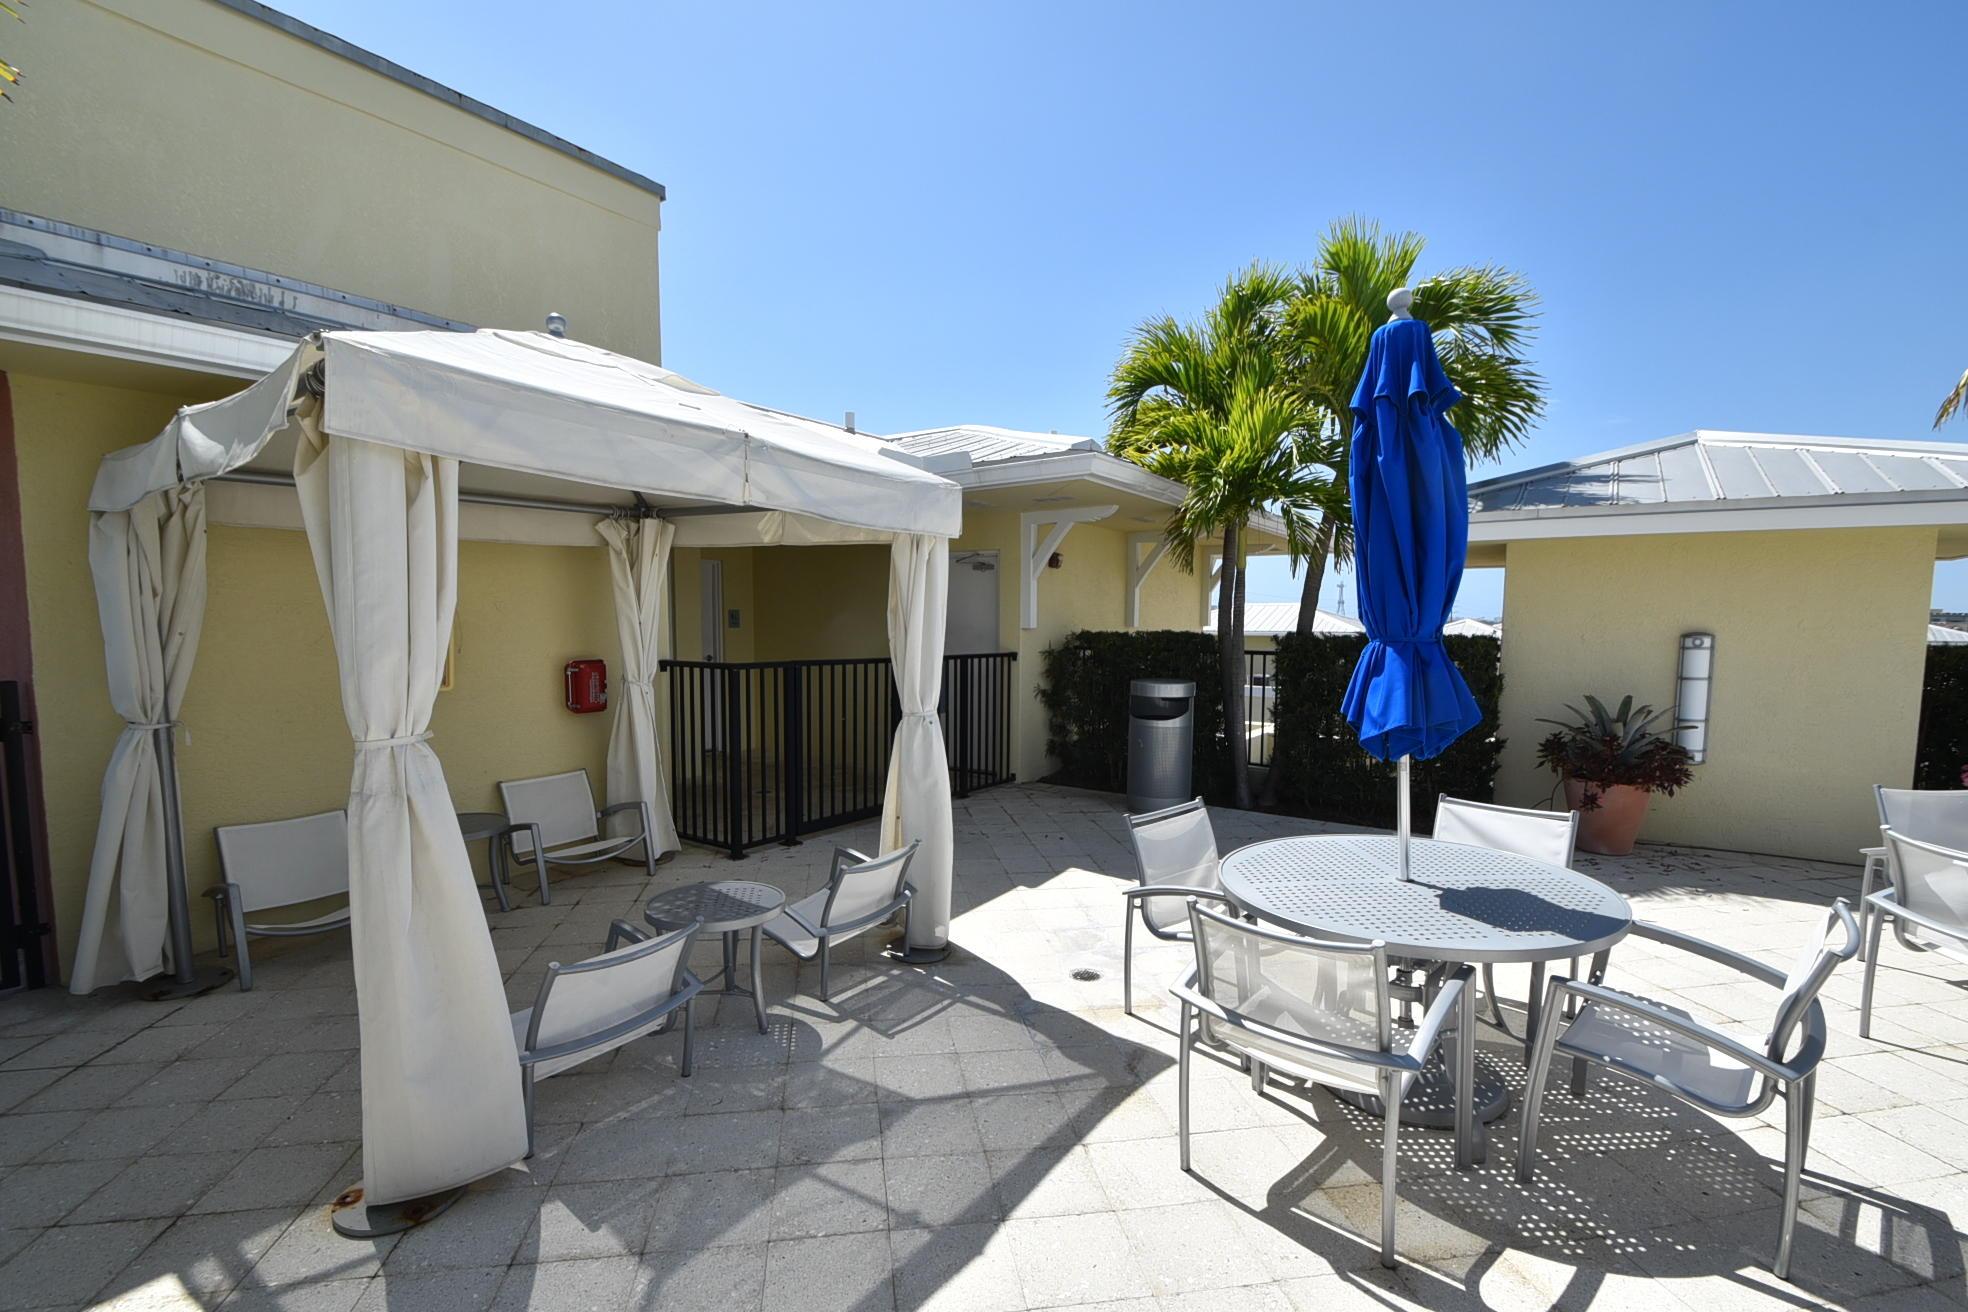 235 1st Street,Delray Beach,Florida 33444,1 Bedroom Bedrooms,1 BathroomBathrooms,Condo/coop,1st,RX-10617393